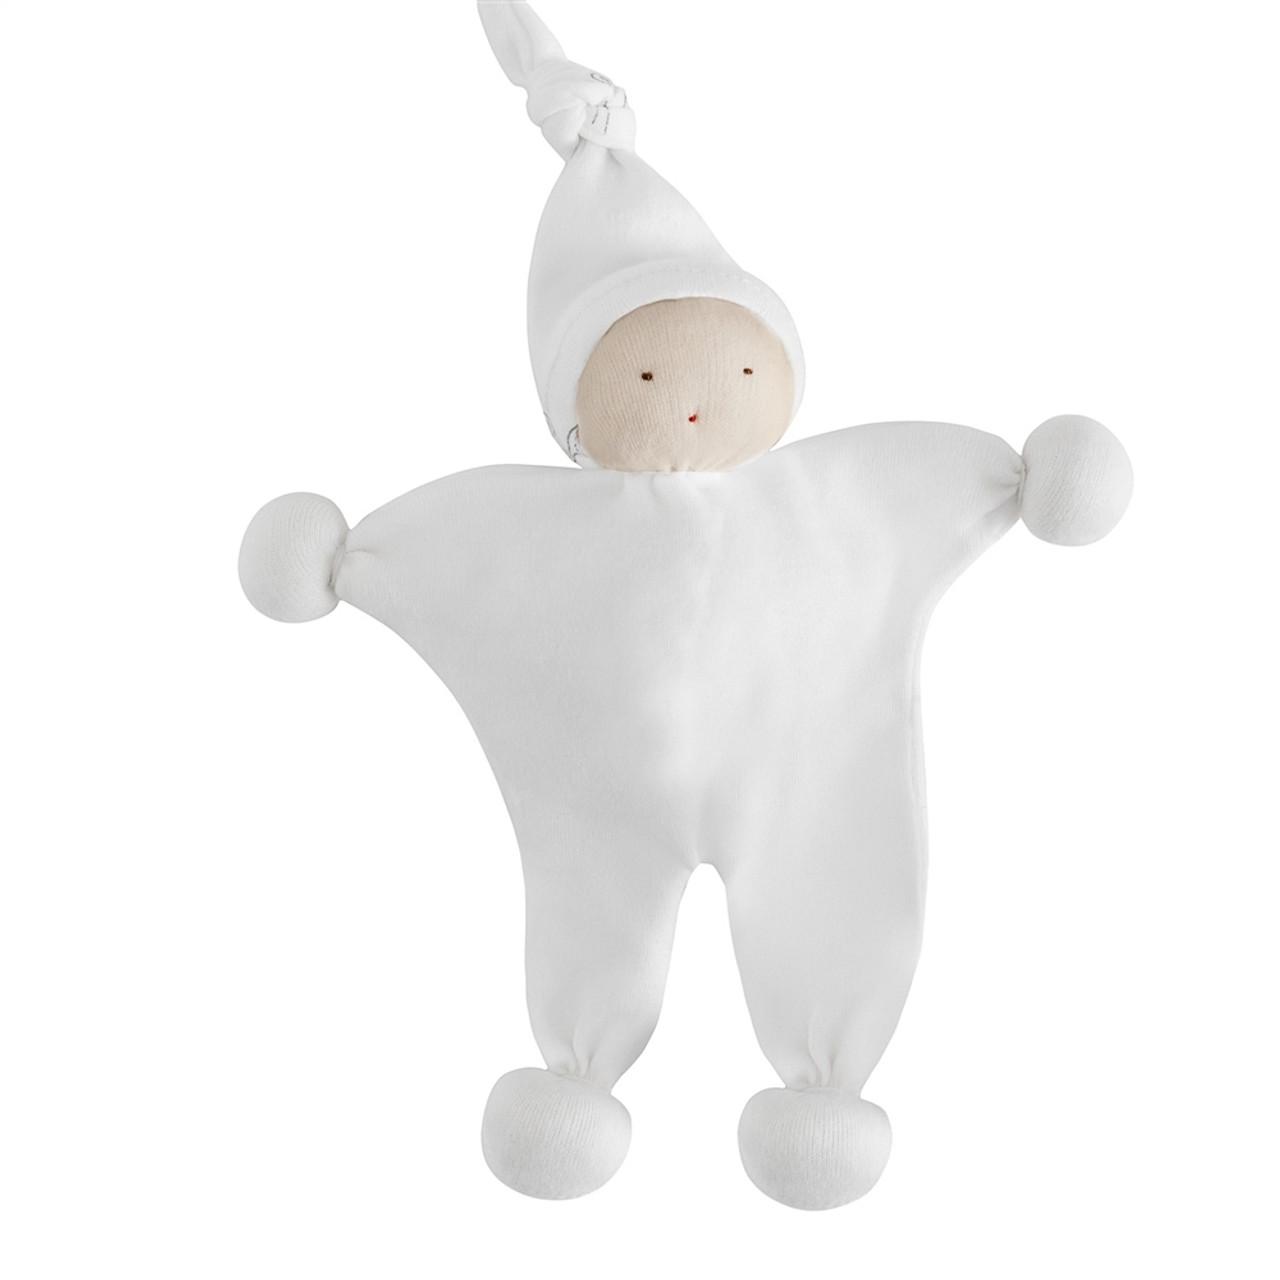 Organic Lovey Toy - White